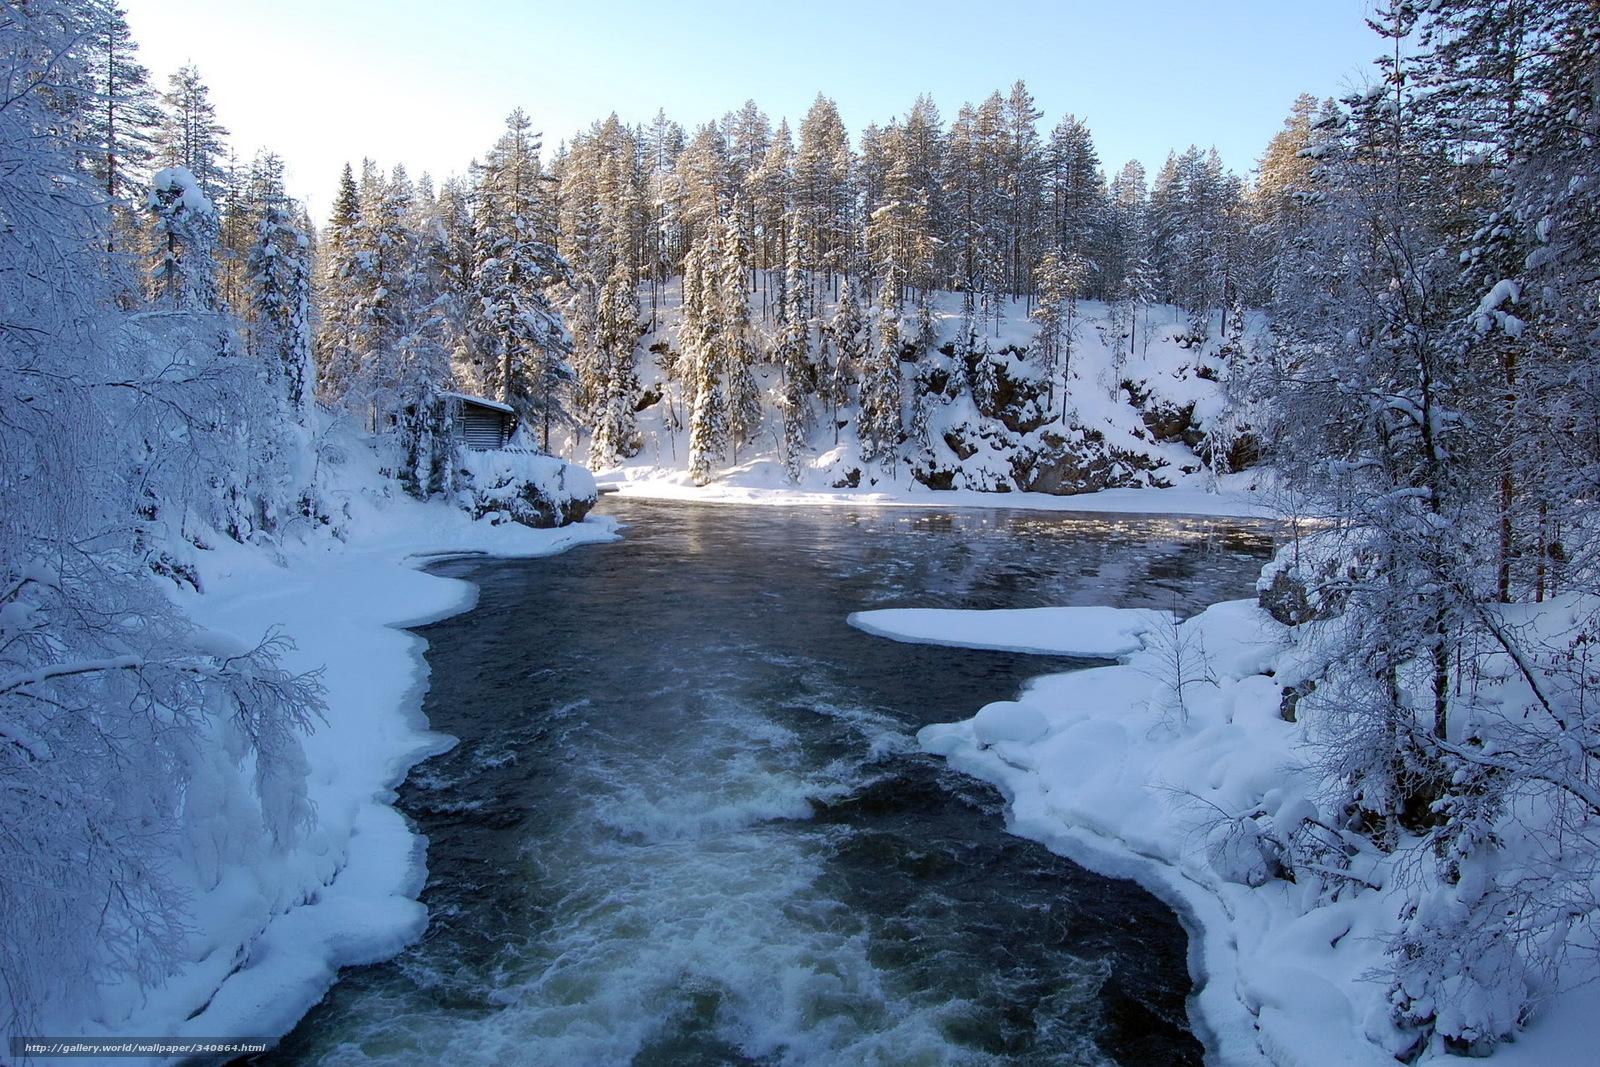 Download wallpaper Winter river snow forest desktop wallpaper 1600x1067